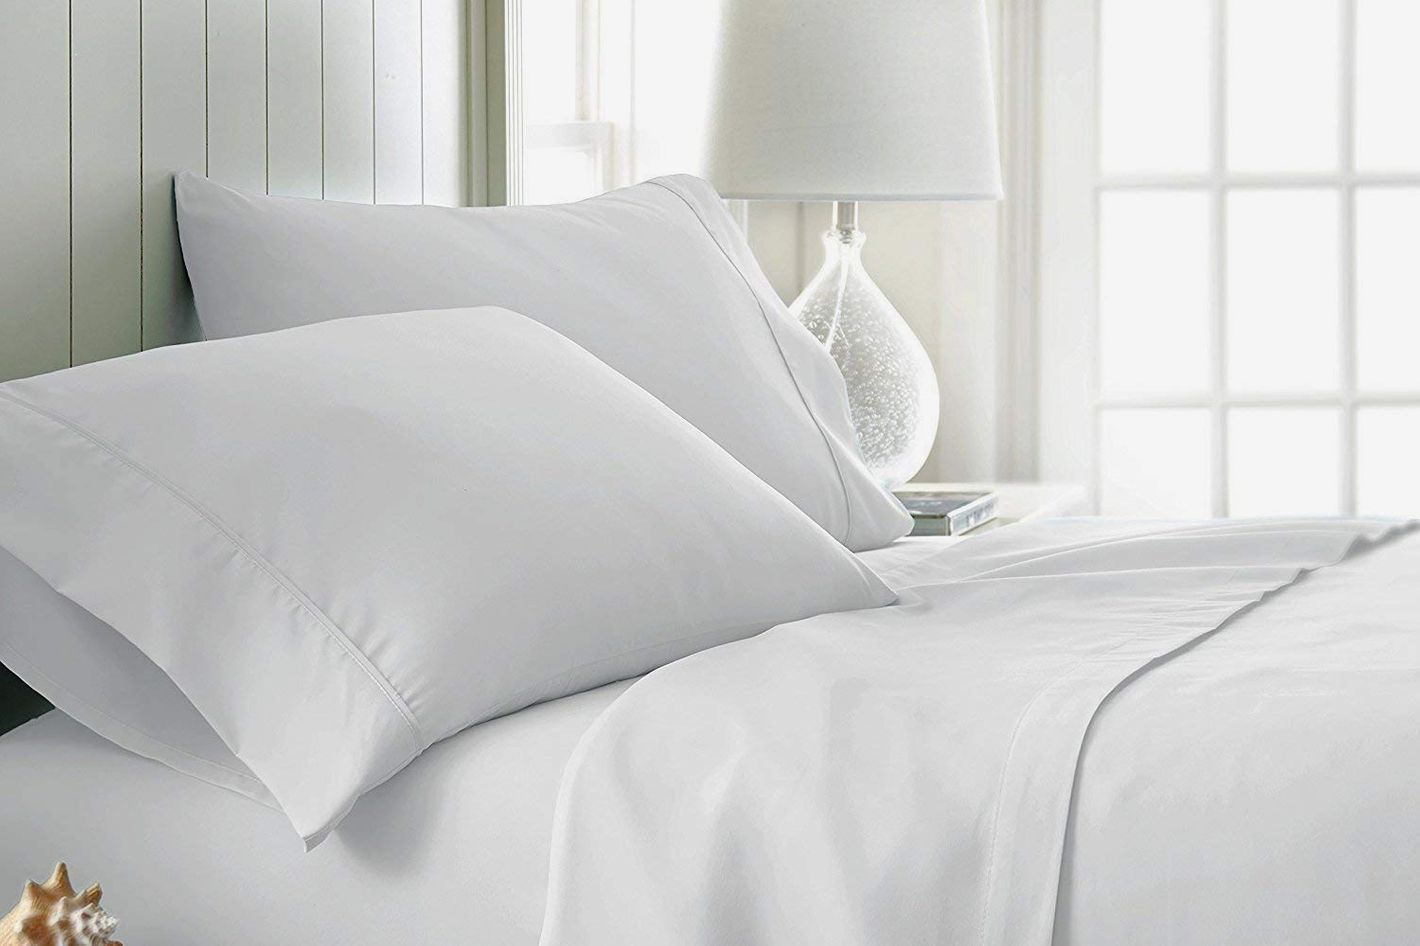 Mayfair Linen 600 Thread Count 100 Percent Cotton Sheets